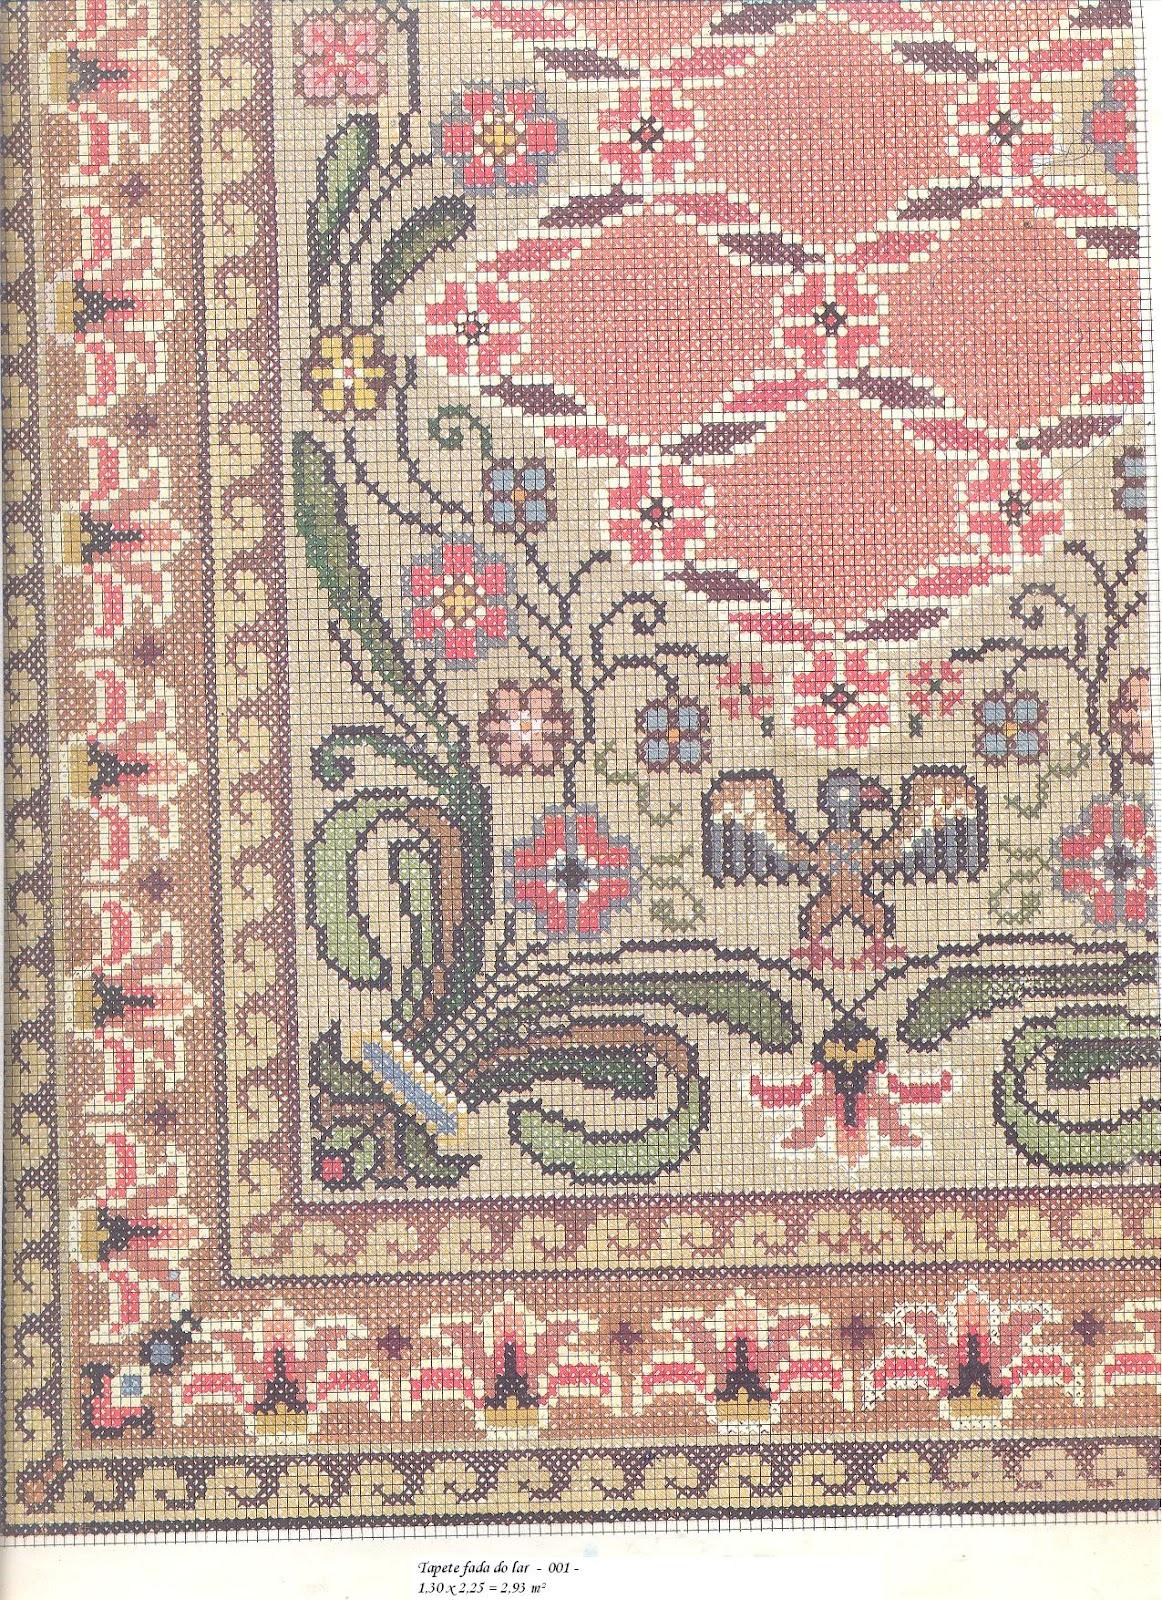 Ana silveira arraiolos portugues 29 1 o3 x 1 87 1 93 for Clases de tapetes